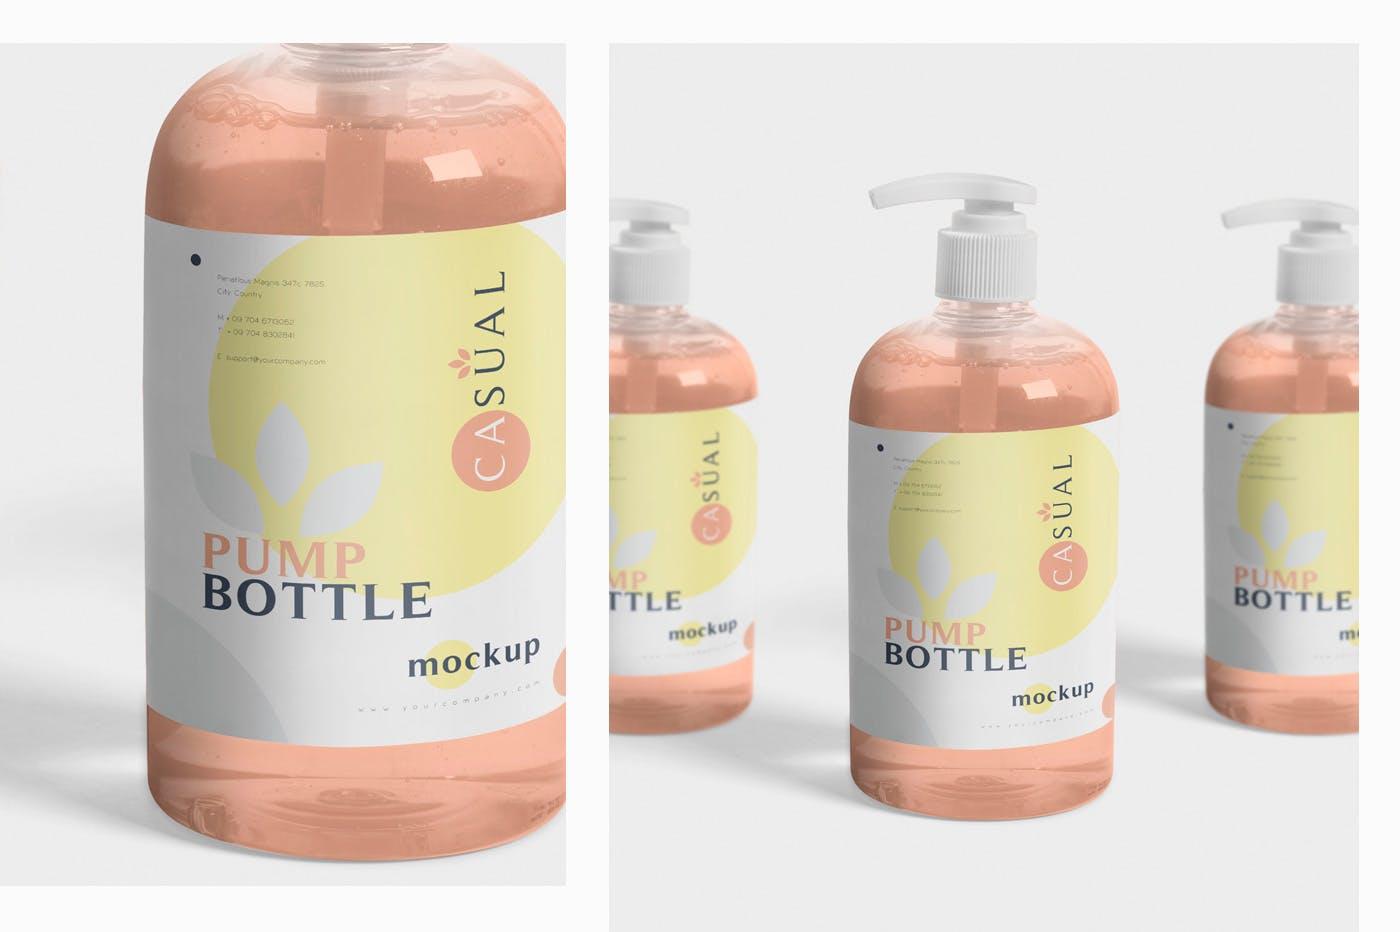 洗化用品品牌VI 素材样机下载Dispenser Pump Bottle Mockup